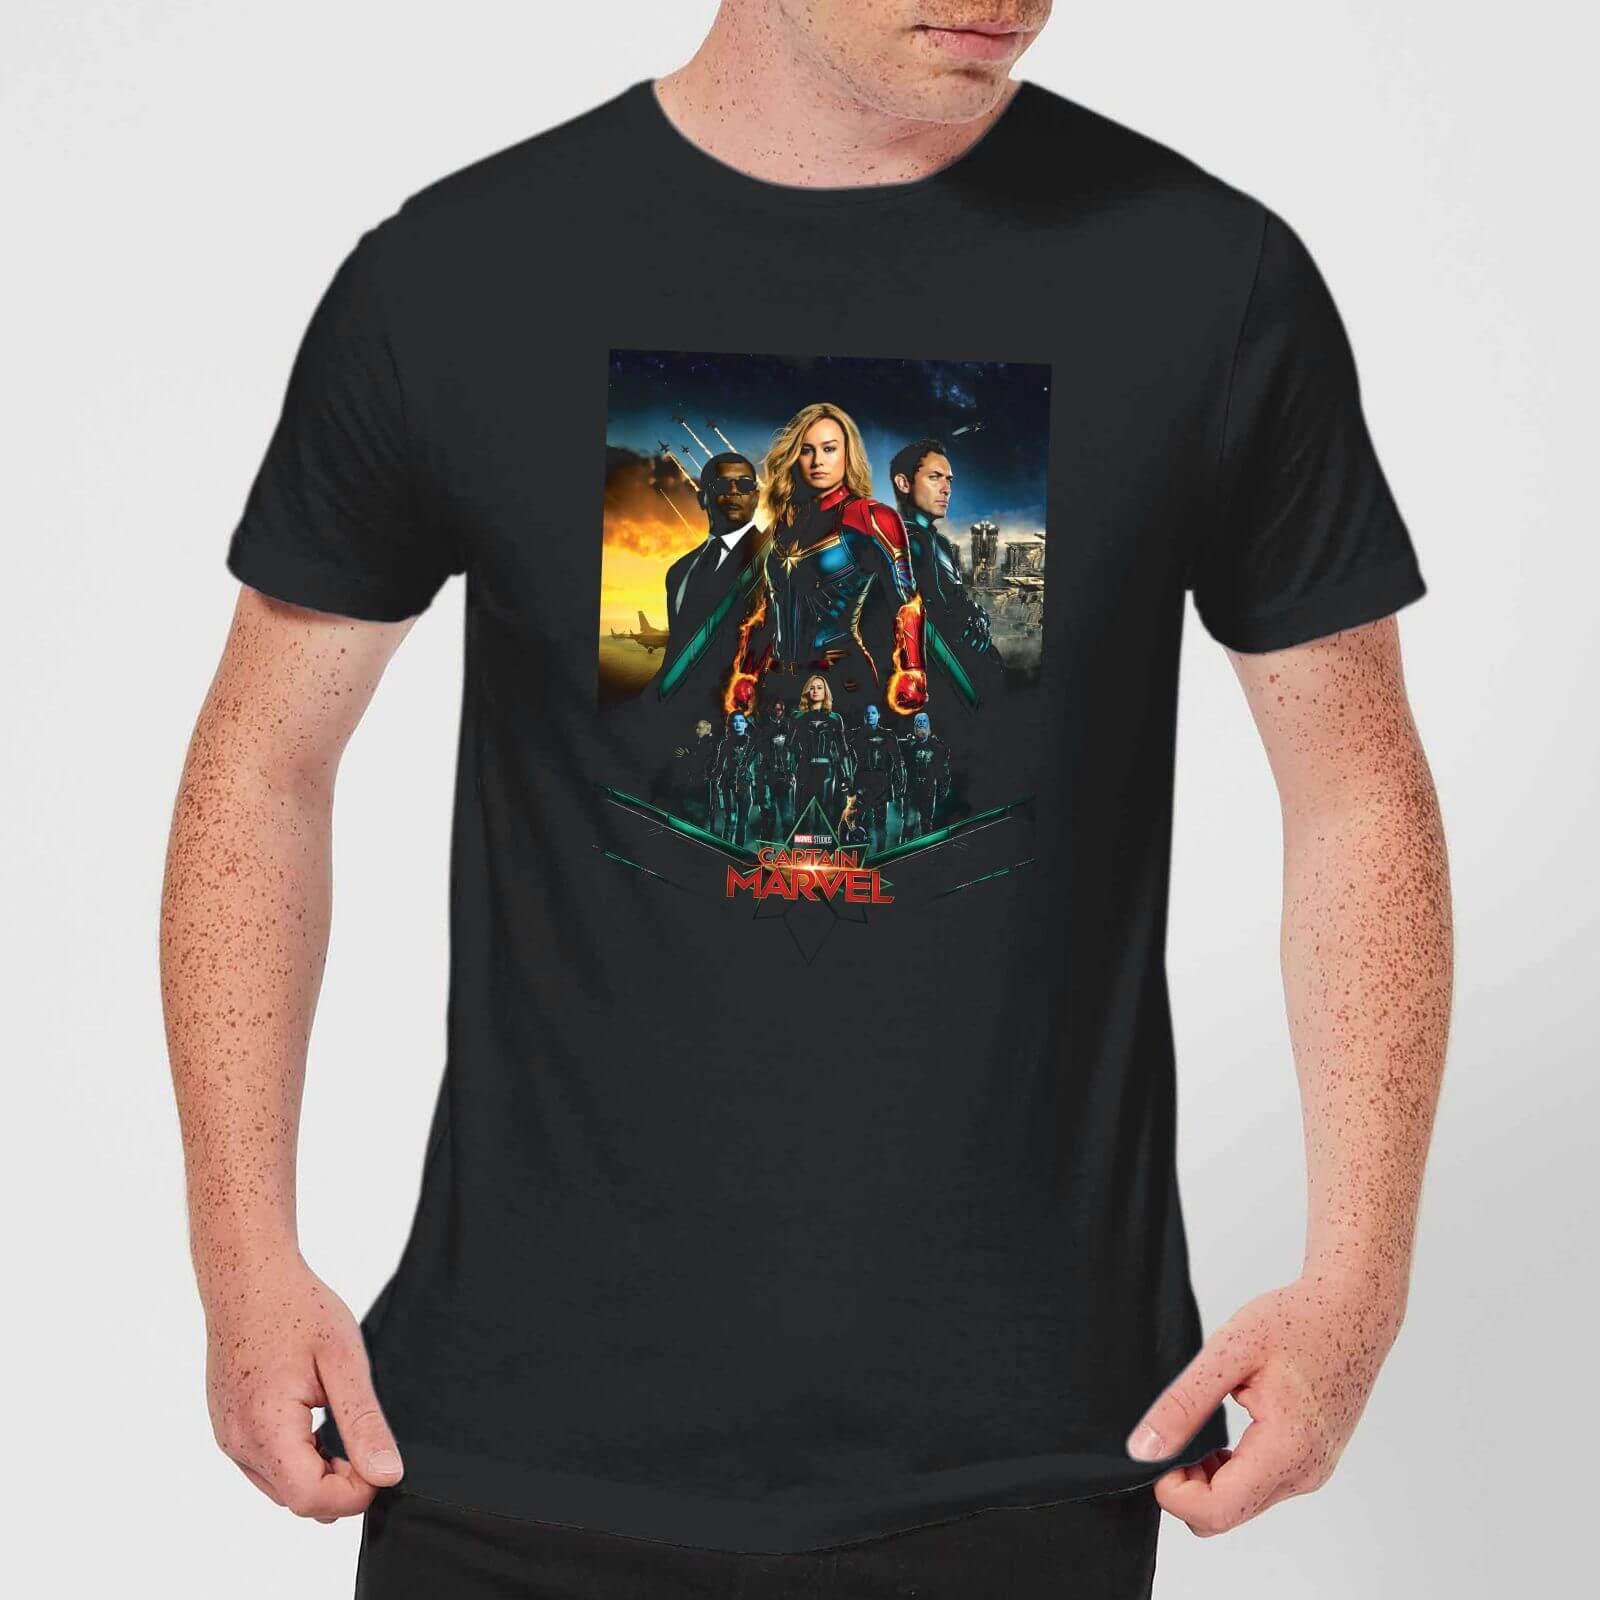 Captain Marvel Movie Starforce Poster Men's T-Shirt - Black - 4XL - Schwarz